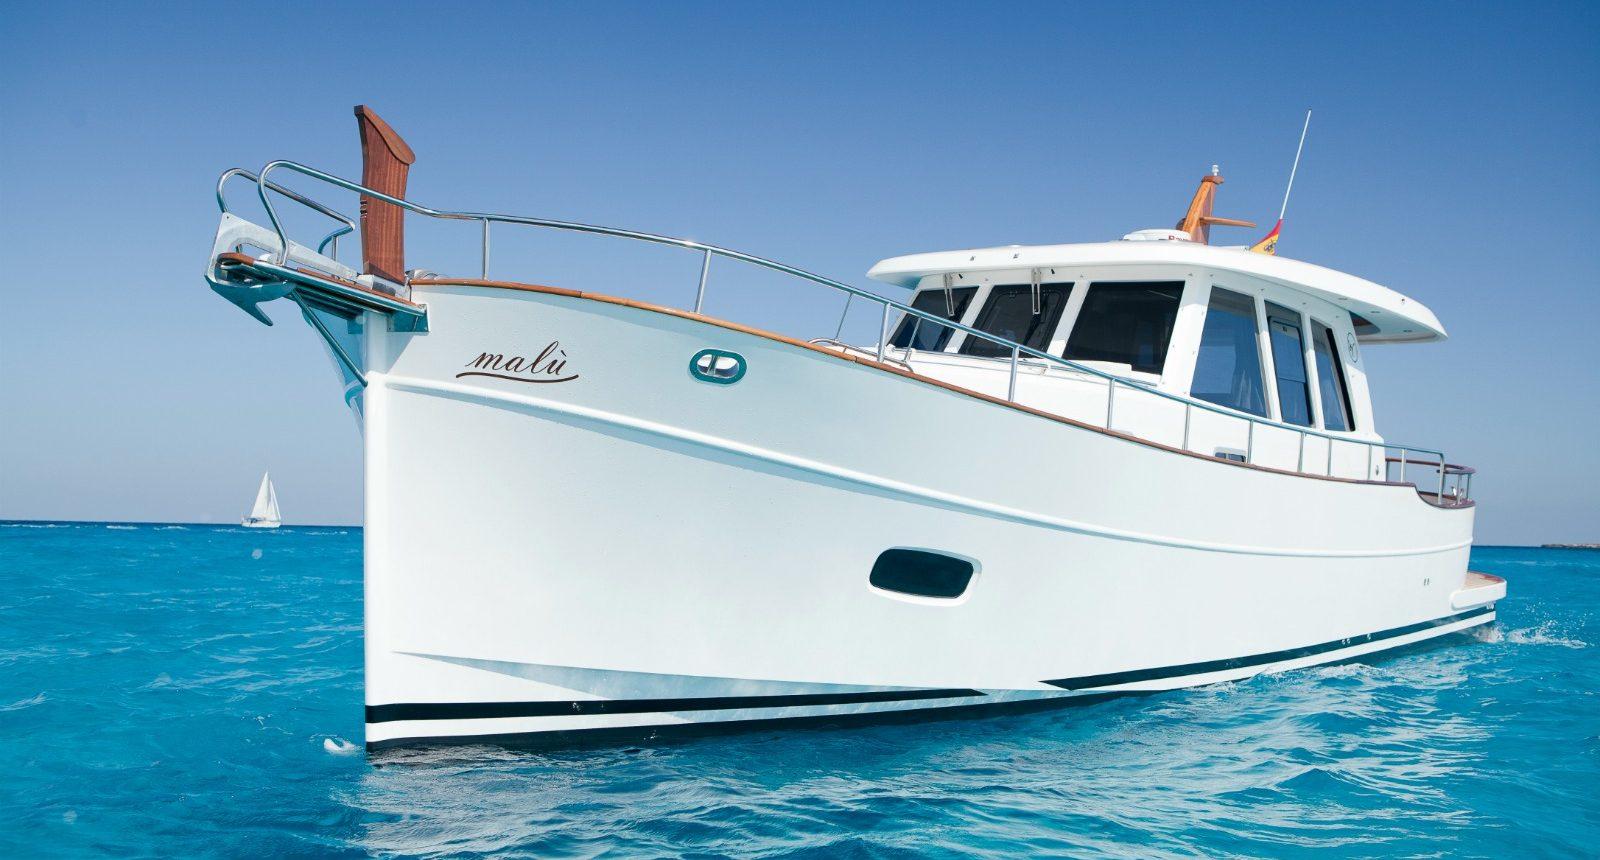 Minorca Islander 42 yacht for sale